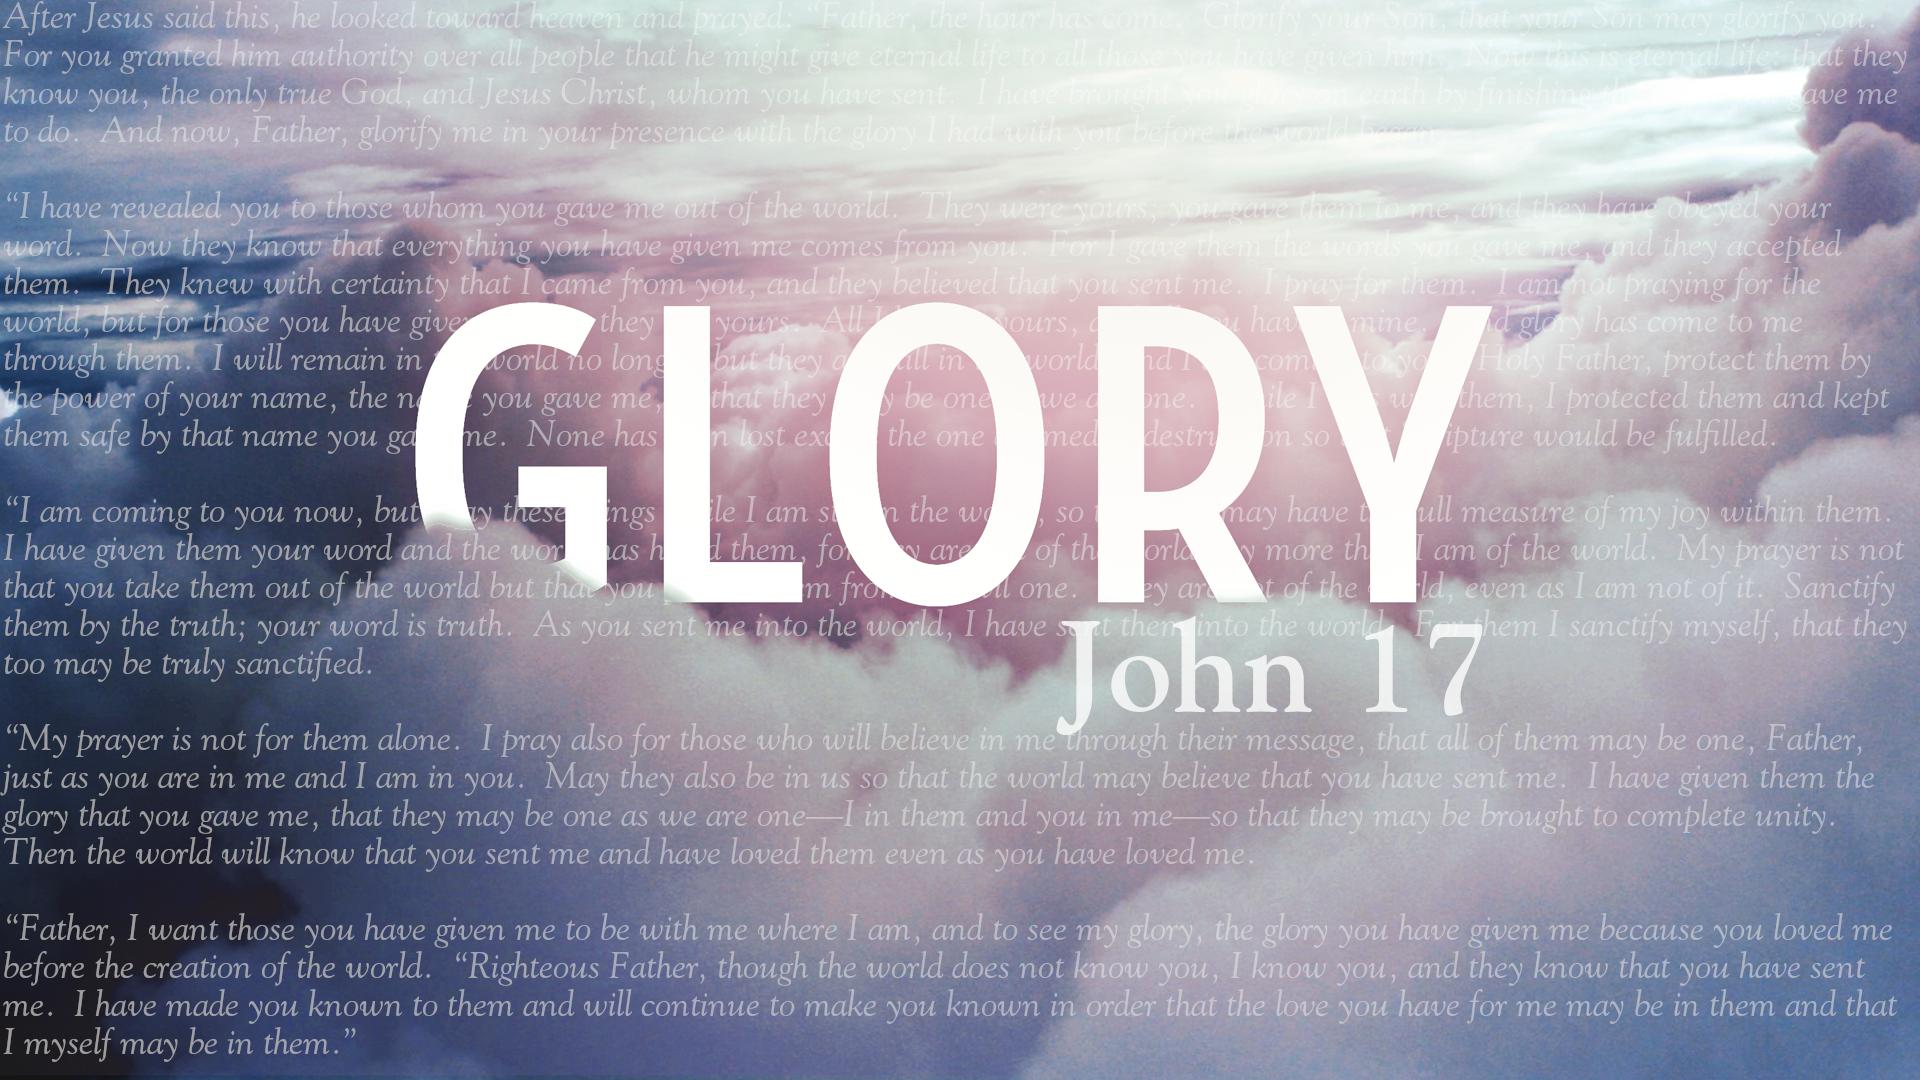 banner-glory-john-17.png